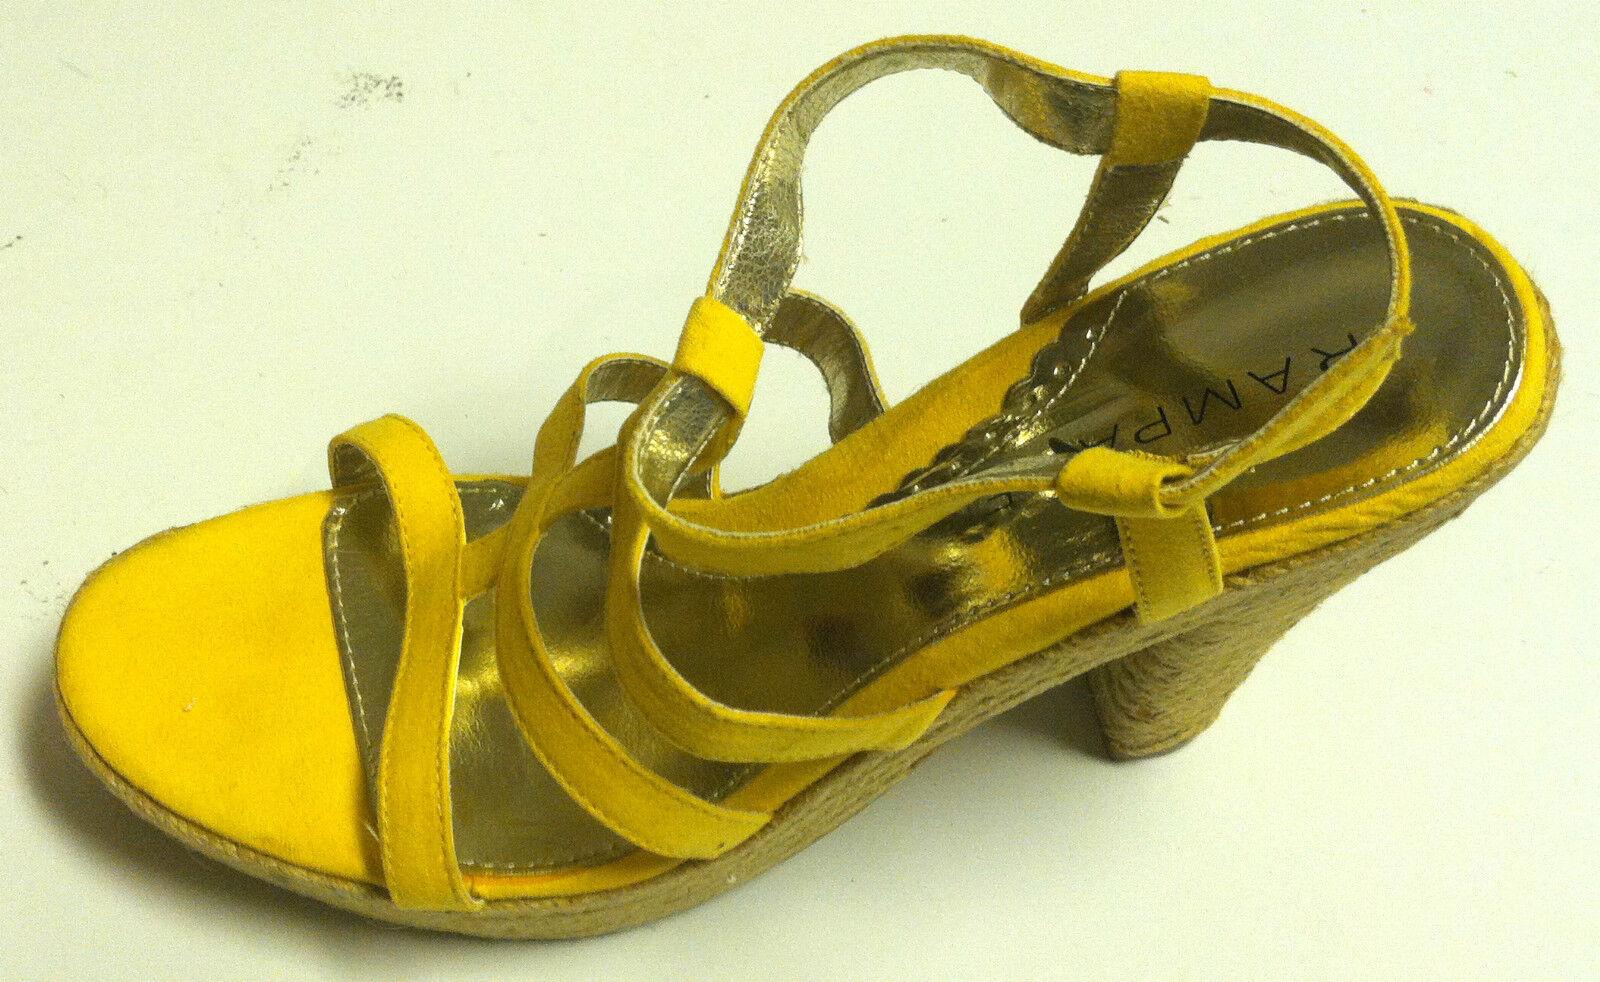 Rampage - Zapatos - AMARILLO - NWOB - b-sho-5